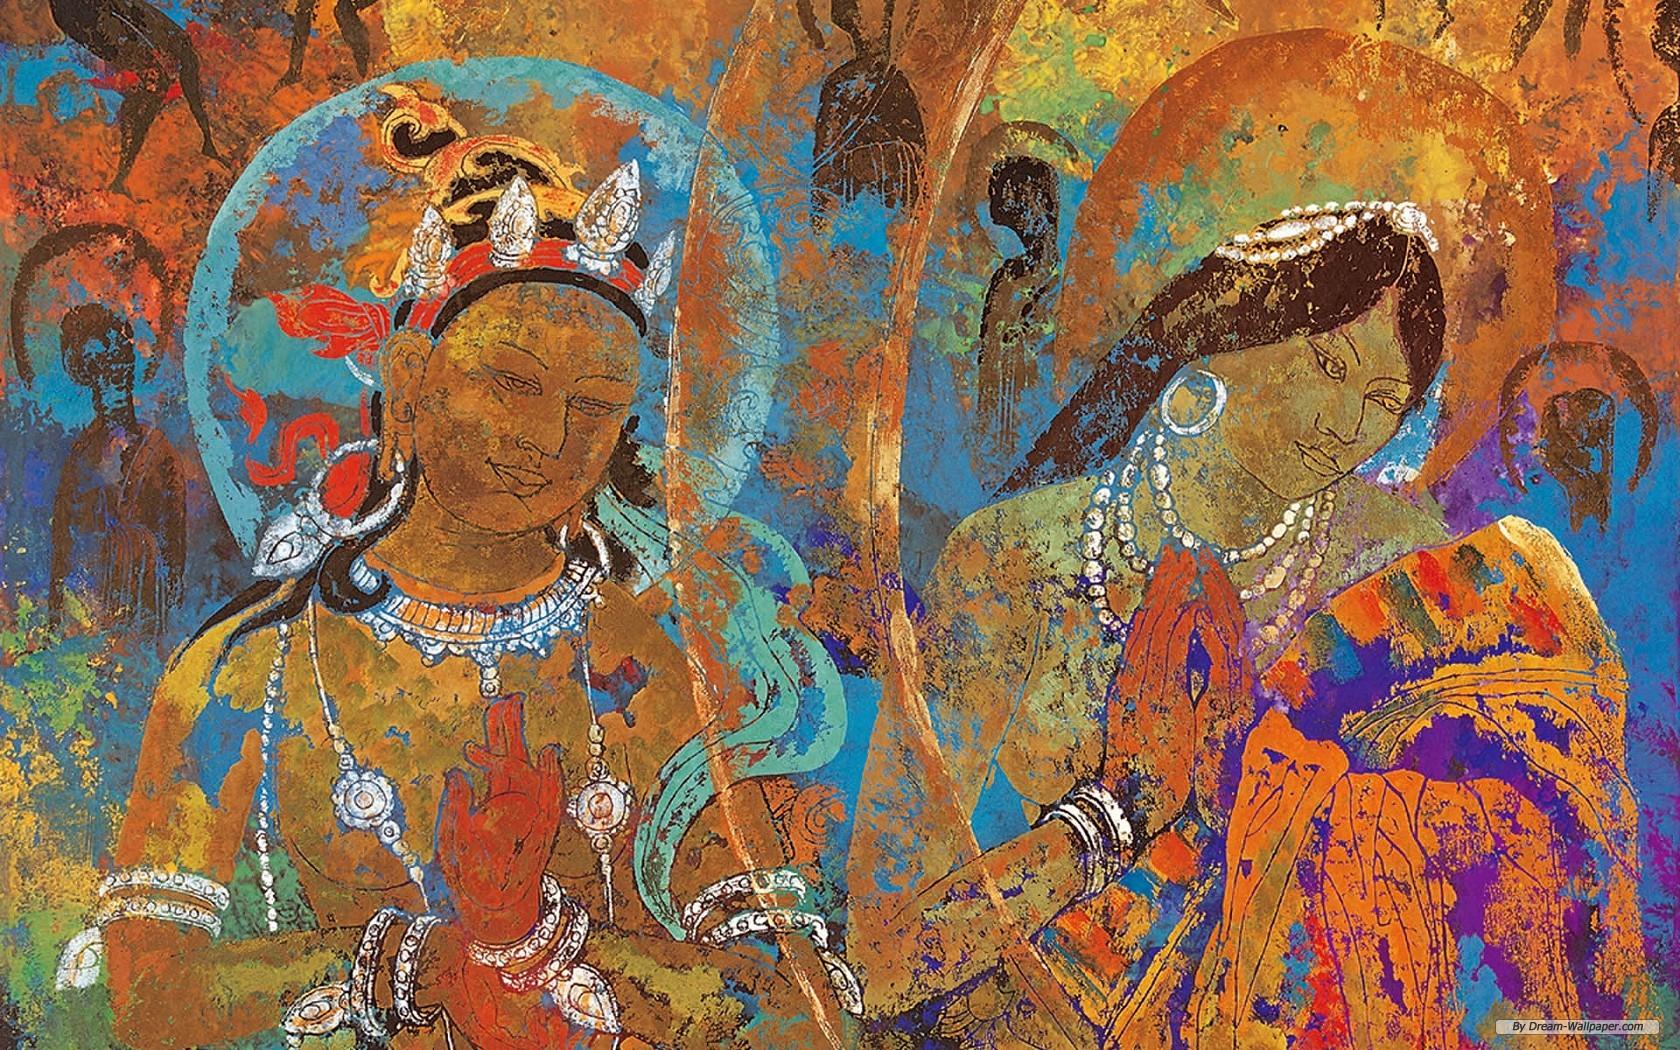 wallpaper   Tibetan Thangka Painting 2 wallpaper   1680x1050 wallpaper 1680x1050